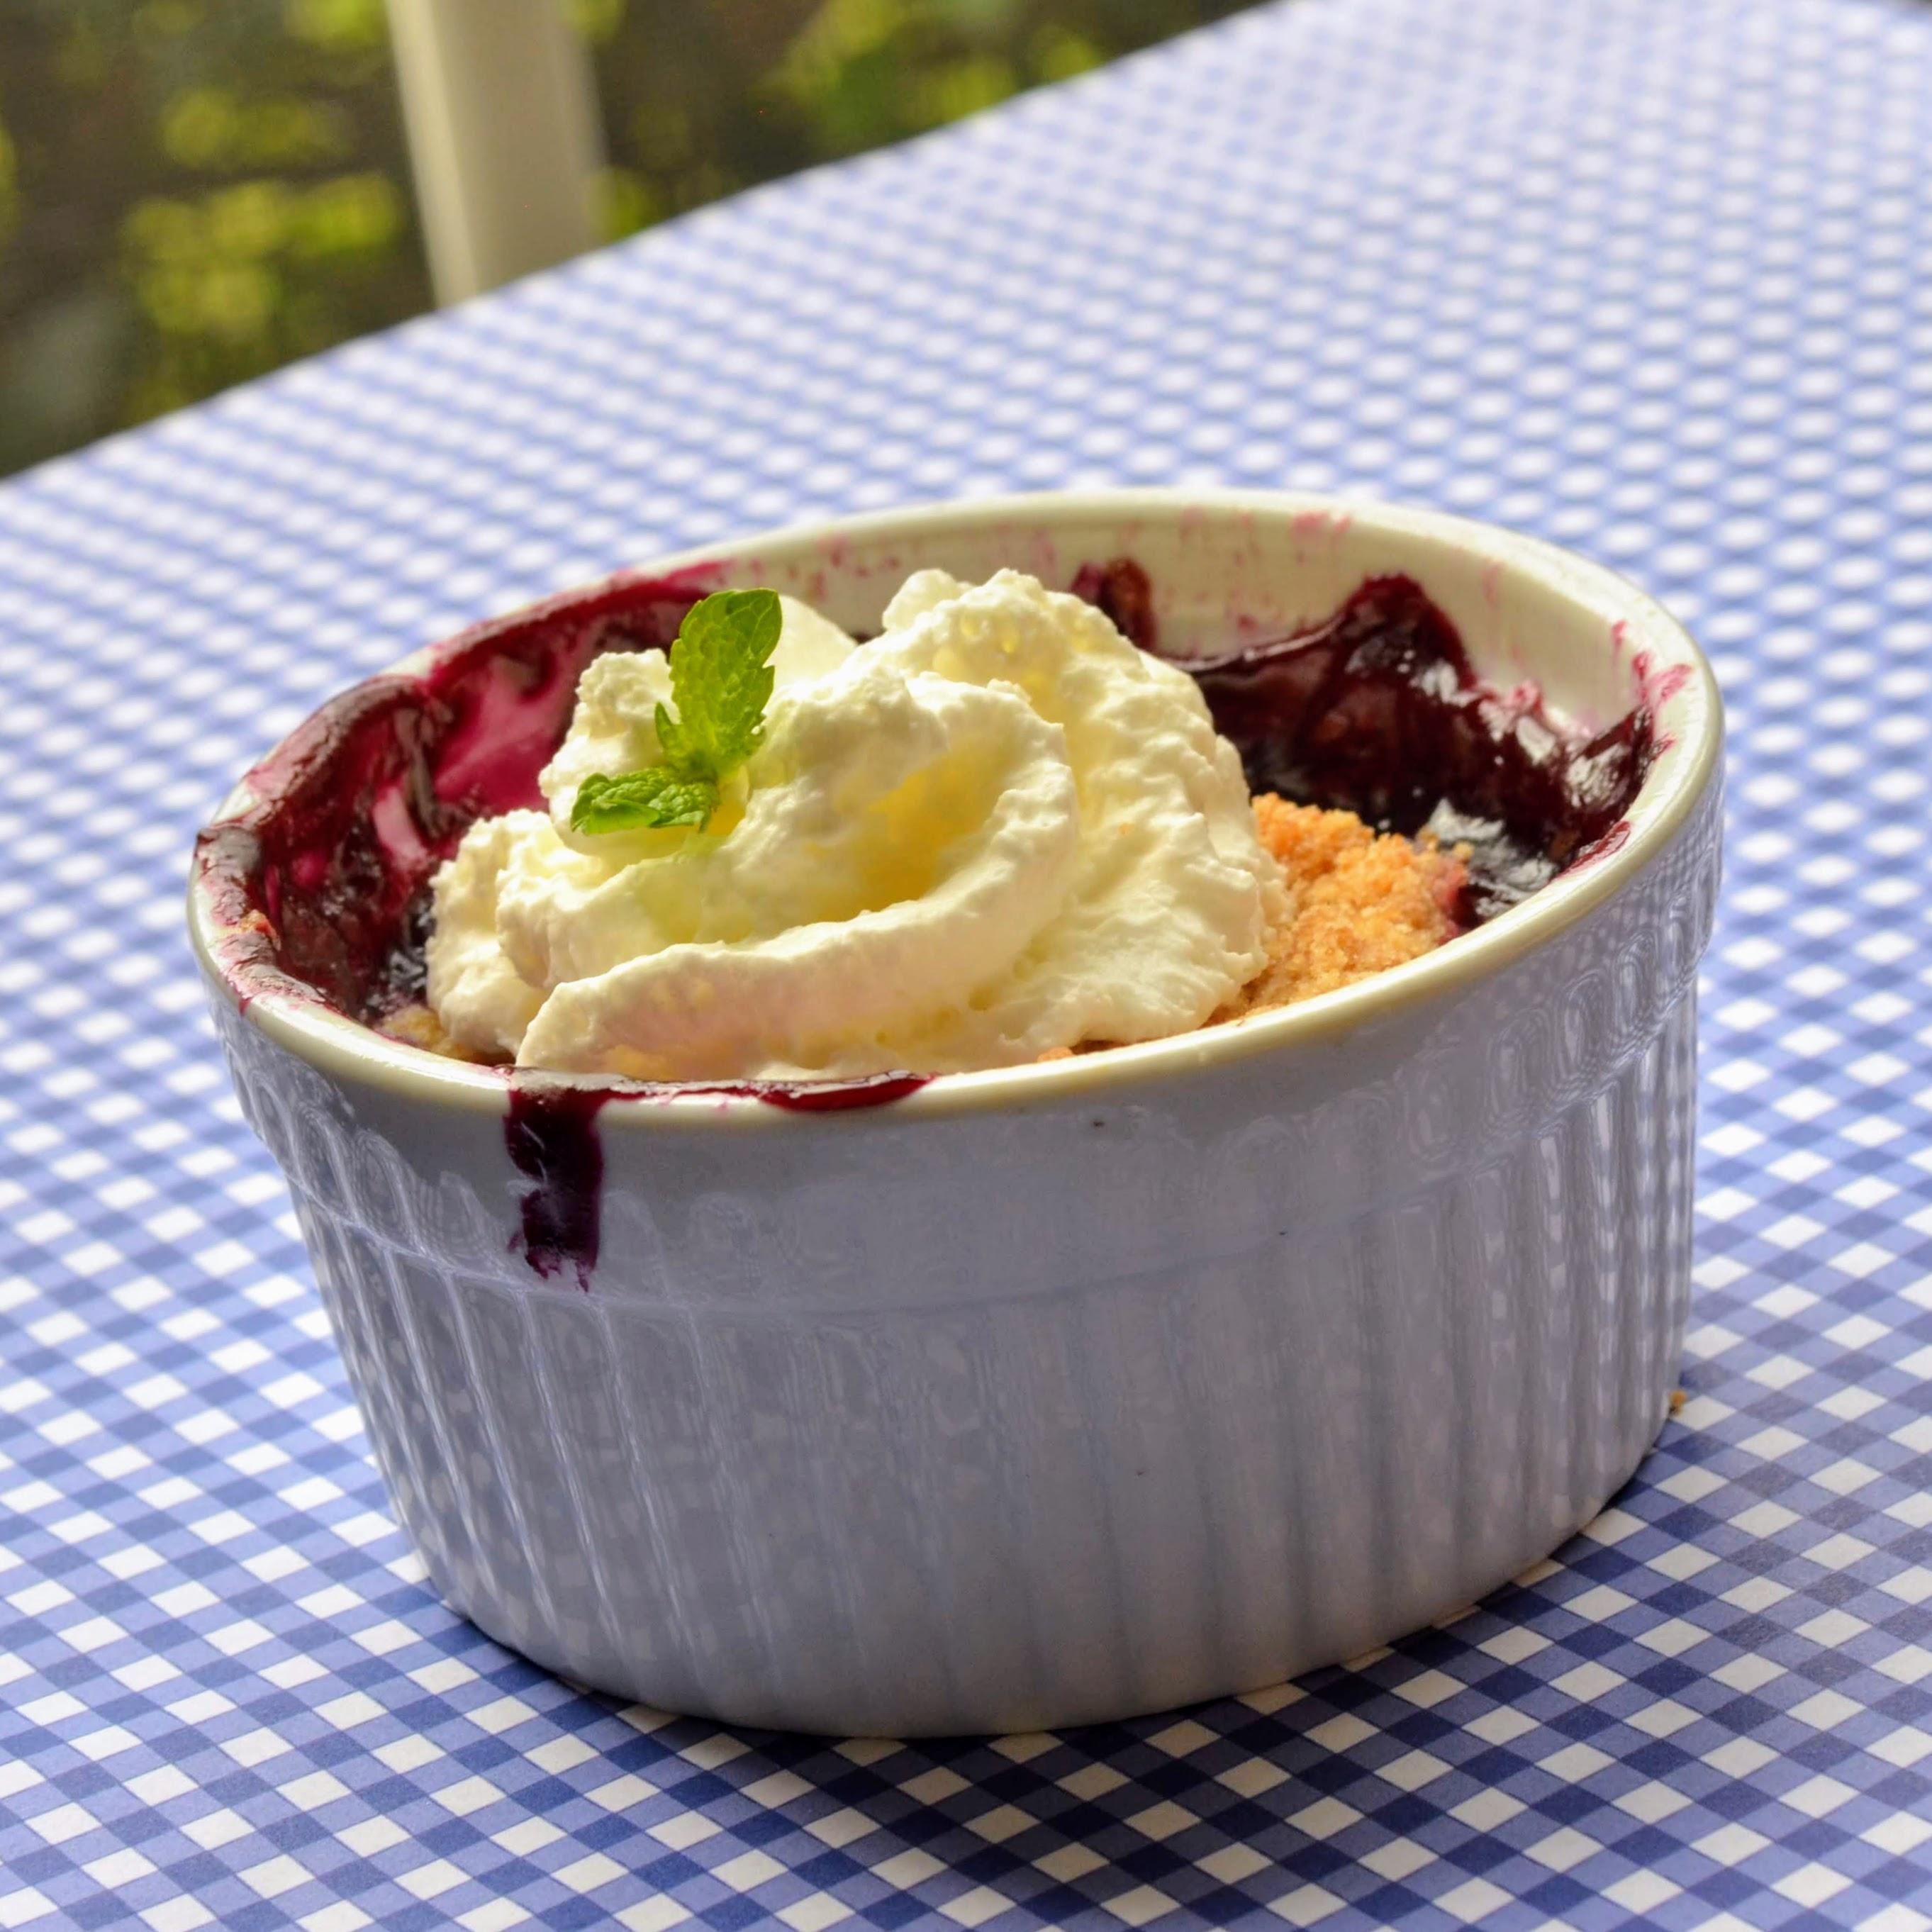 Classic American Blueberry Crisp